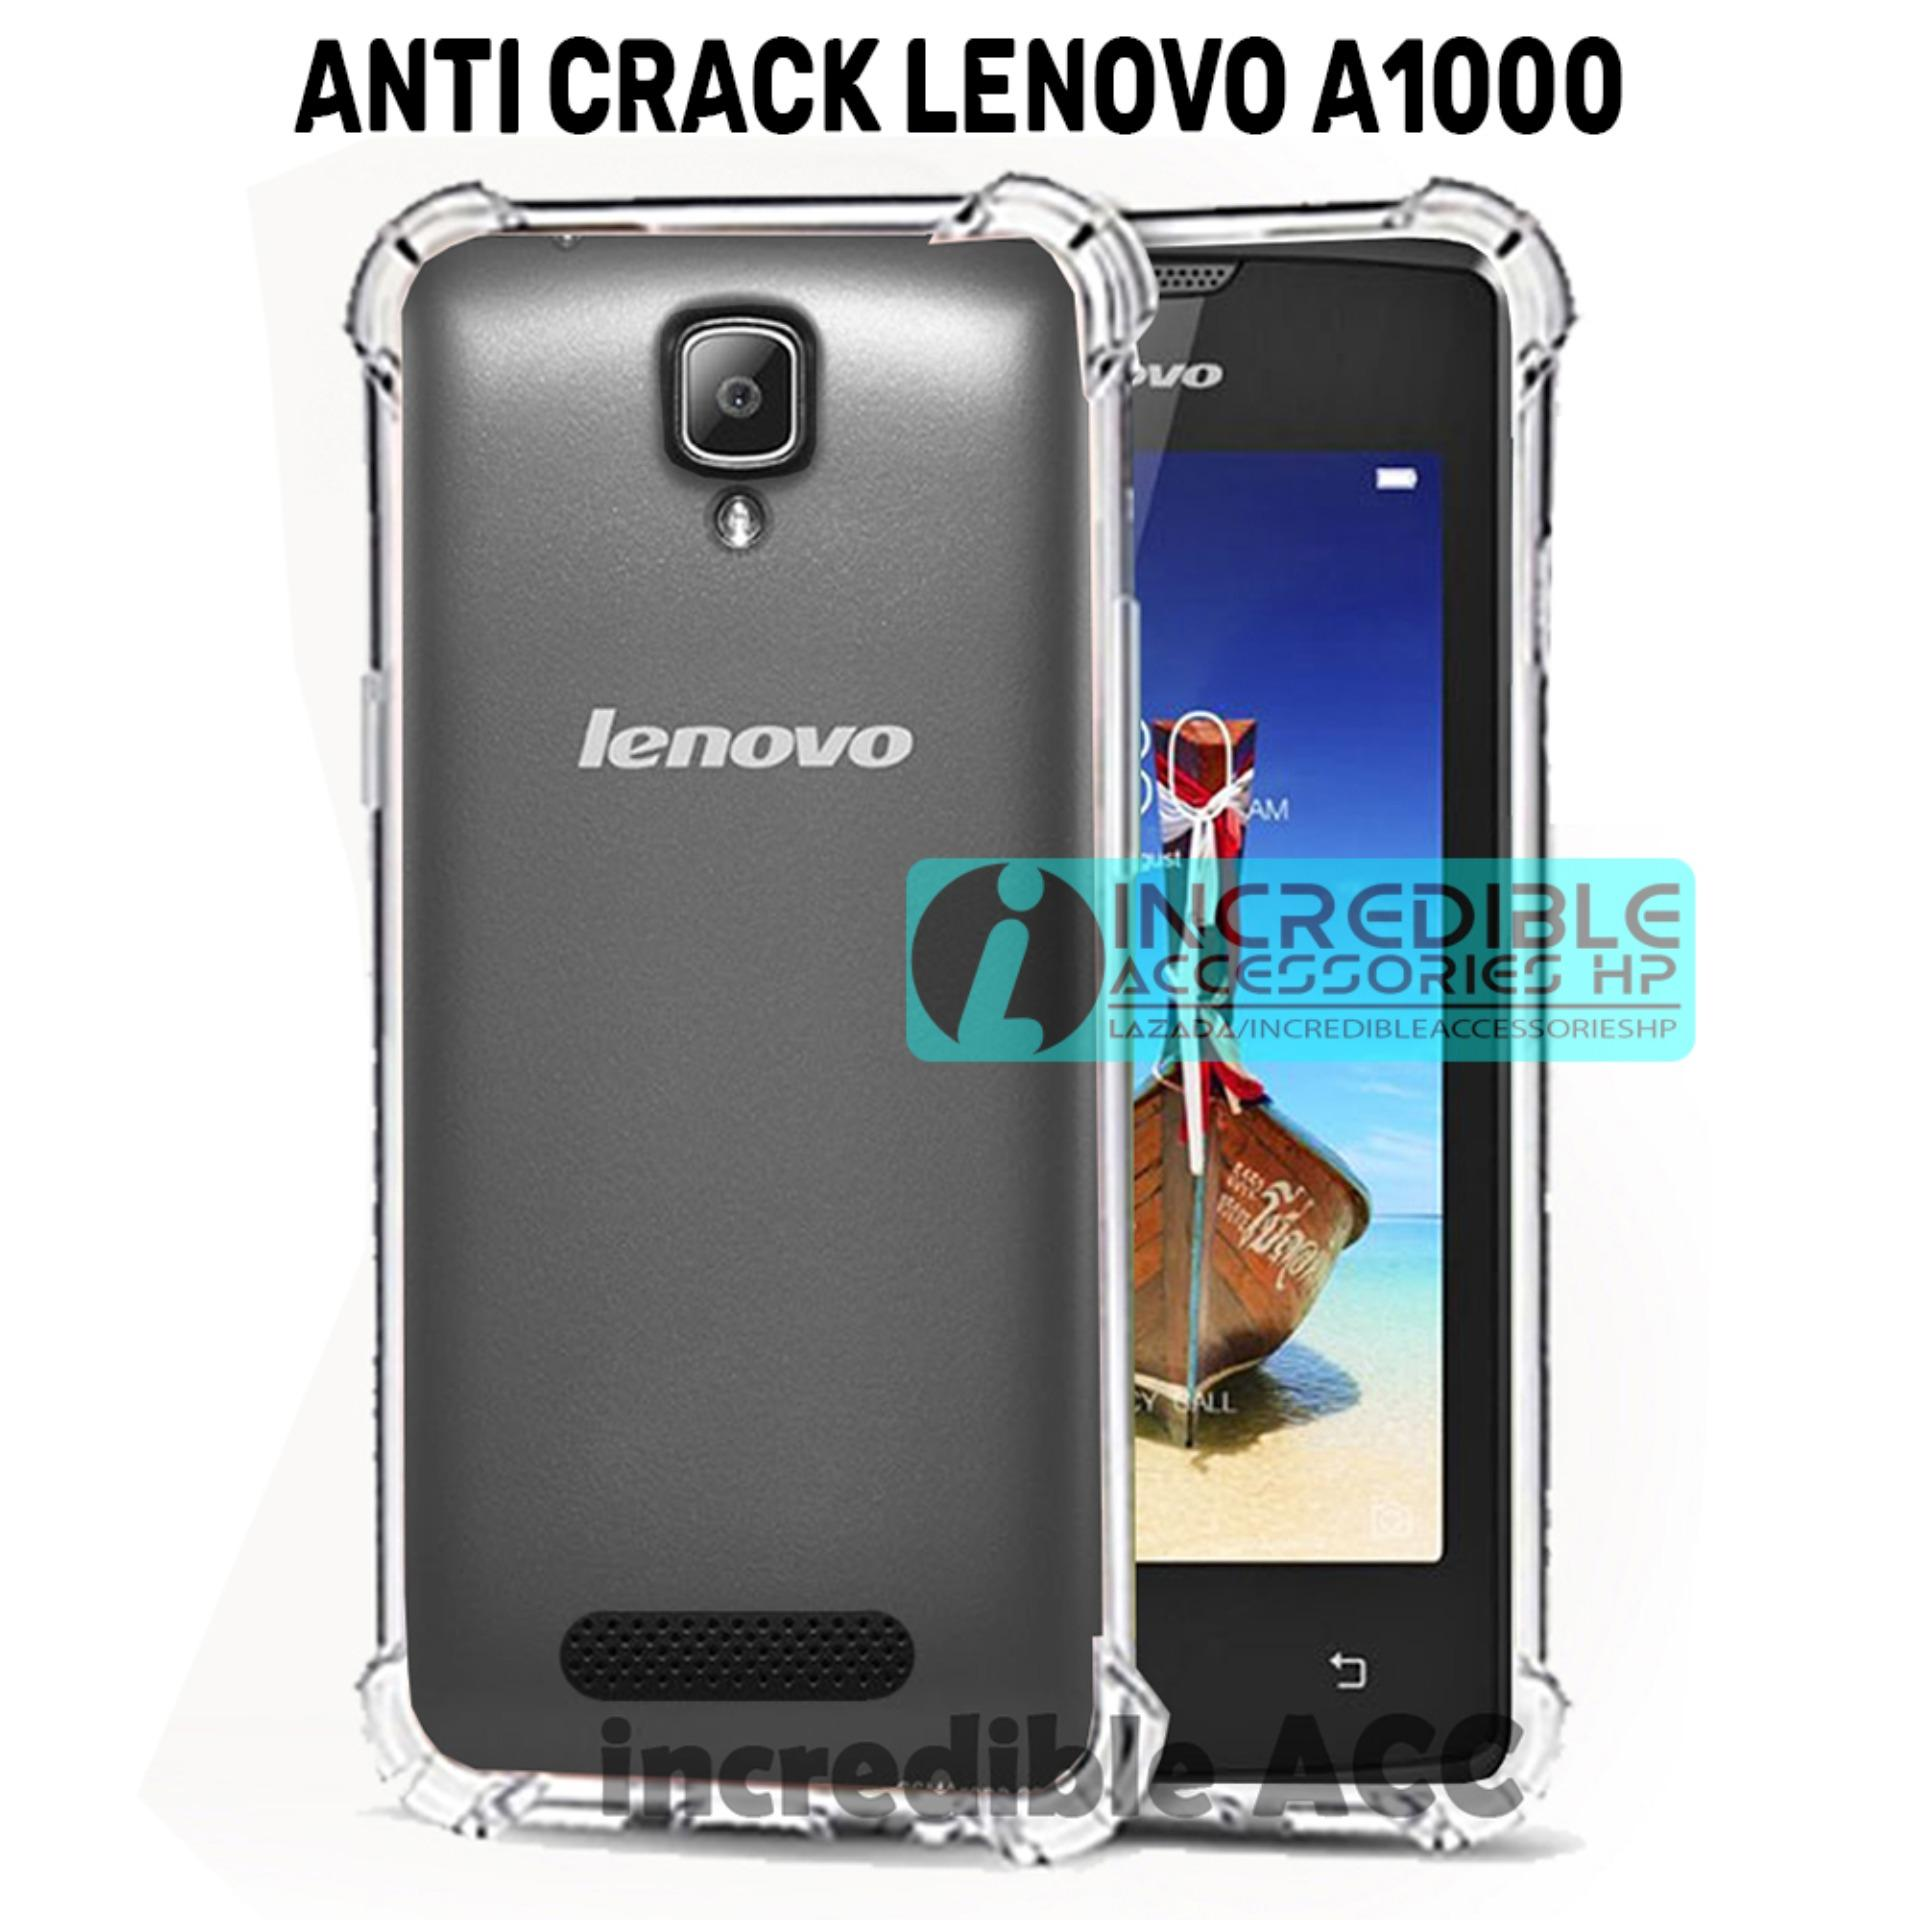 Case Anti Shock / Anti Crack Elegant Softcase  for Lenovo A1000 / A2800 - White Clear